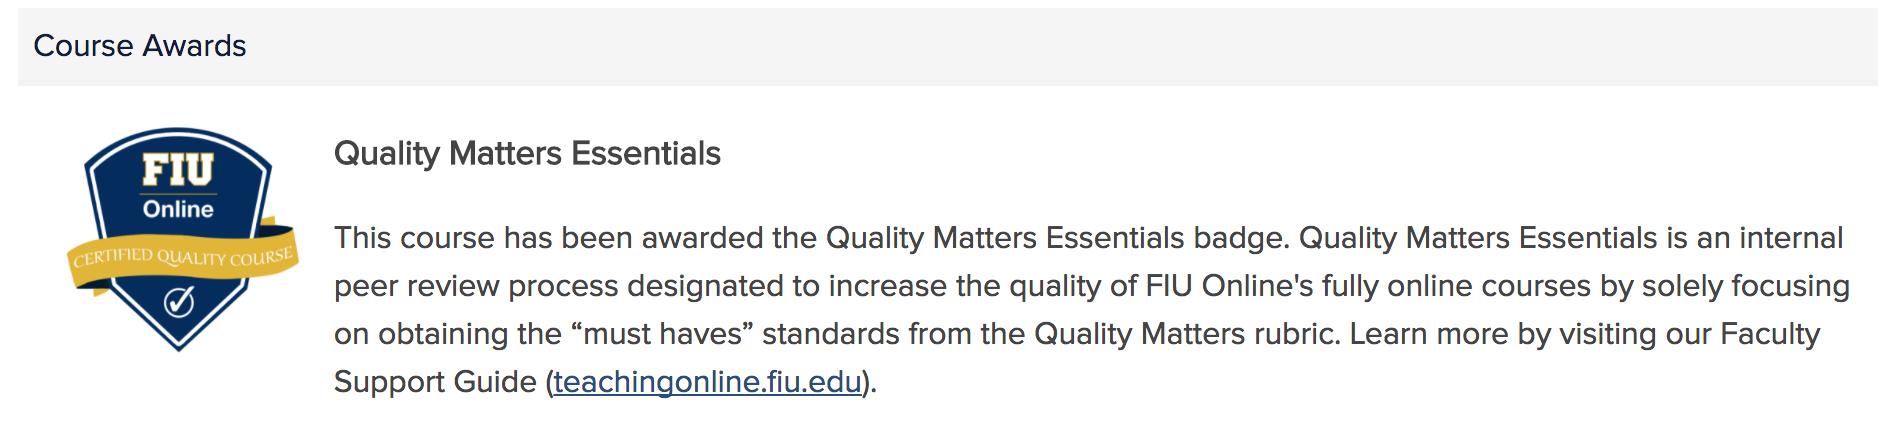 Quality Matters Essentials Qme Fiuonline